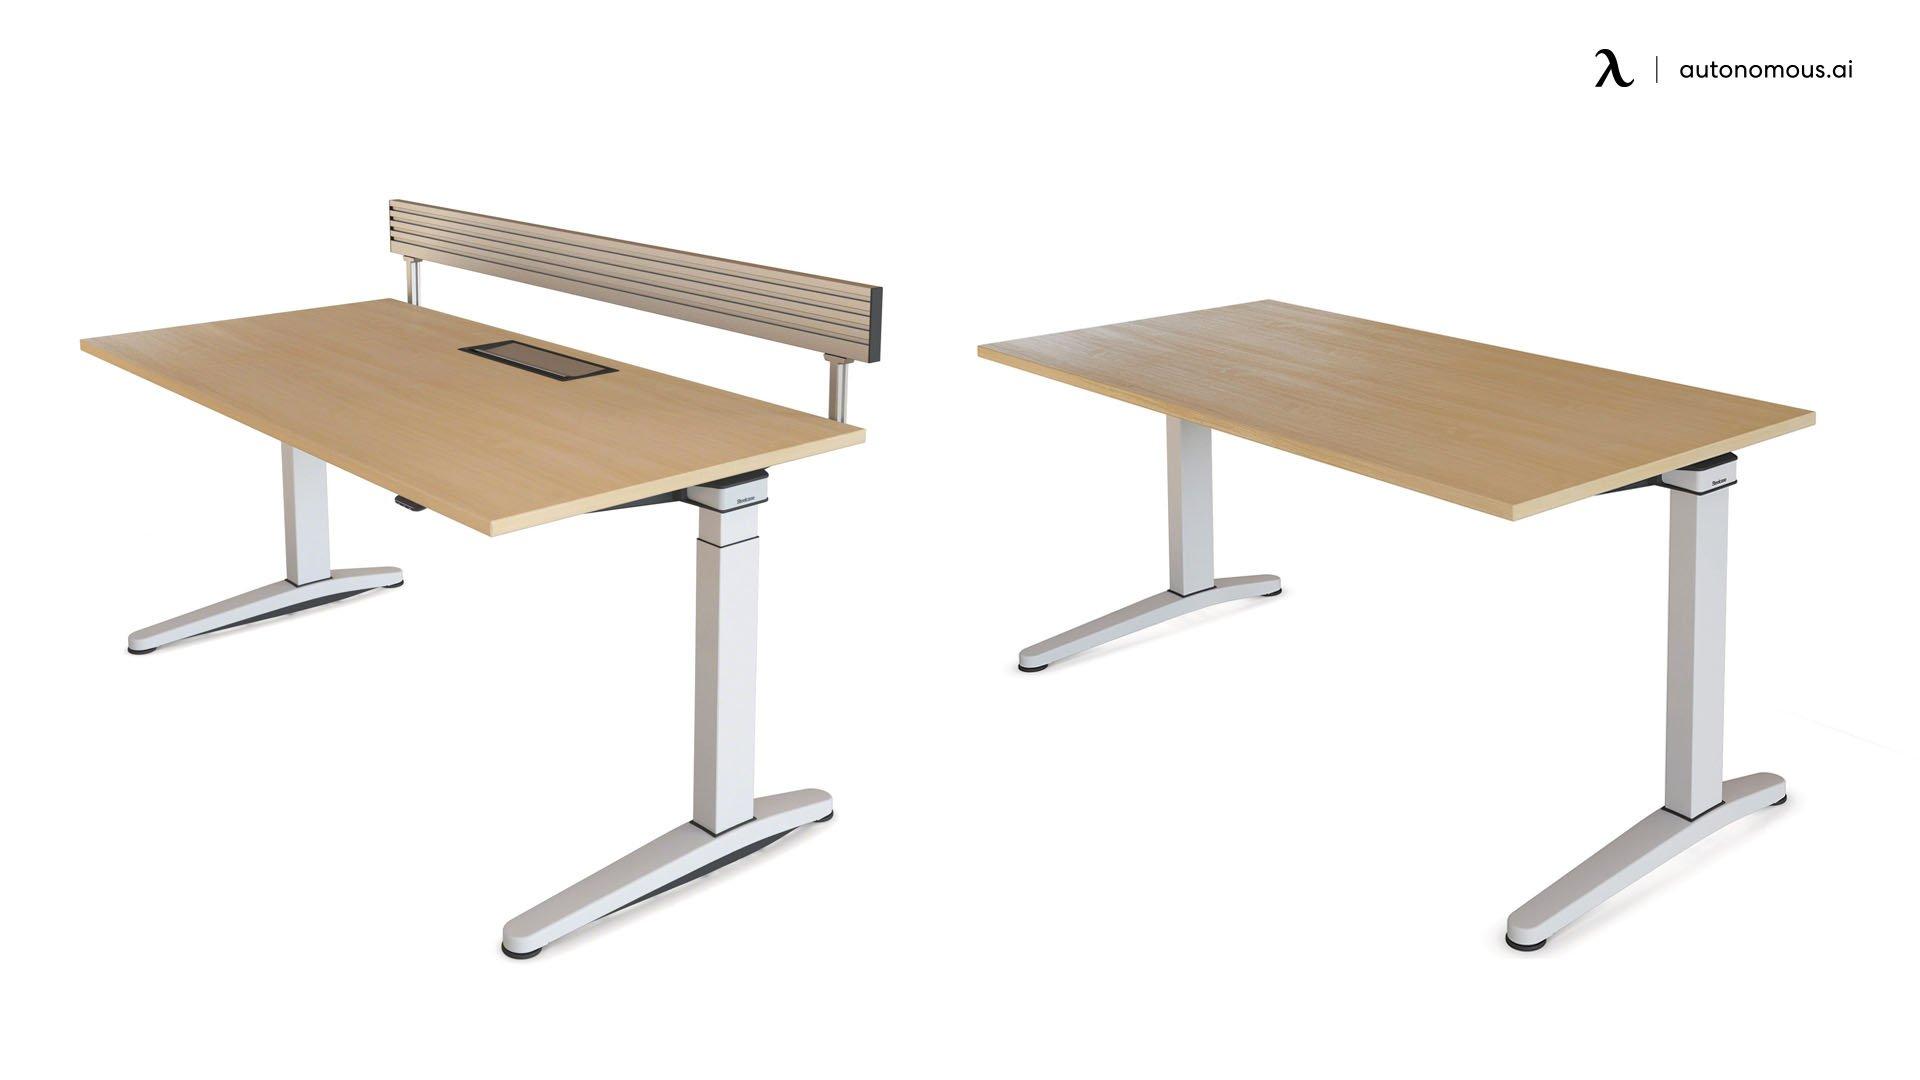 Steelcase Ology Smart Standing Desk